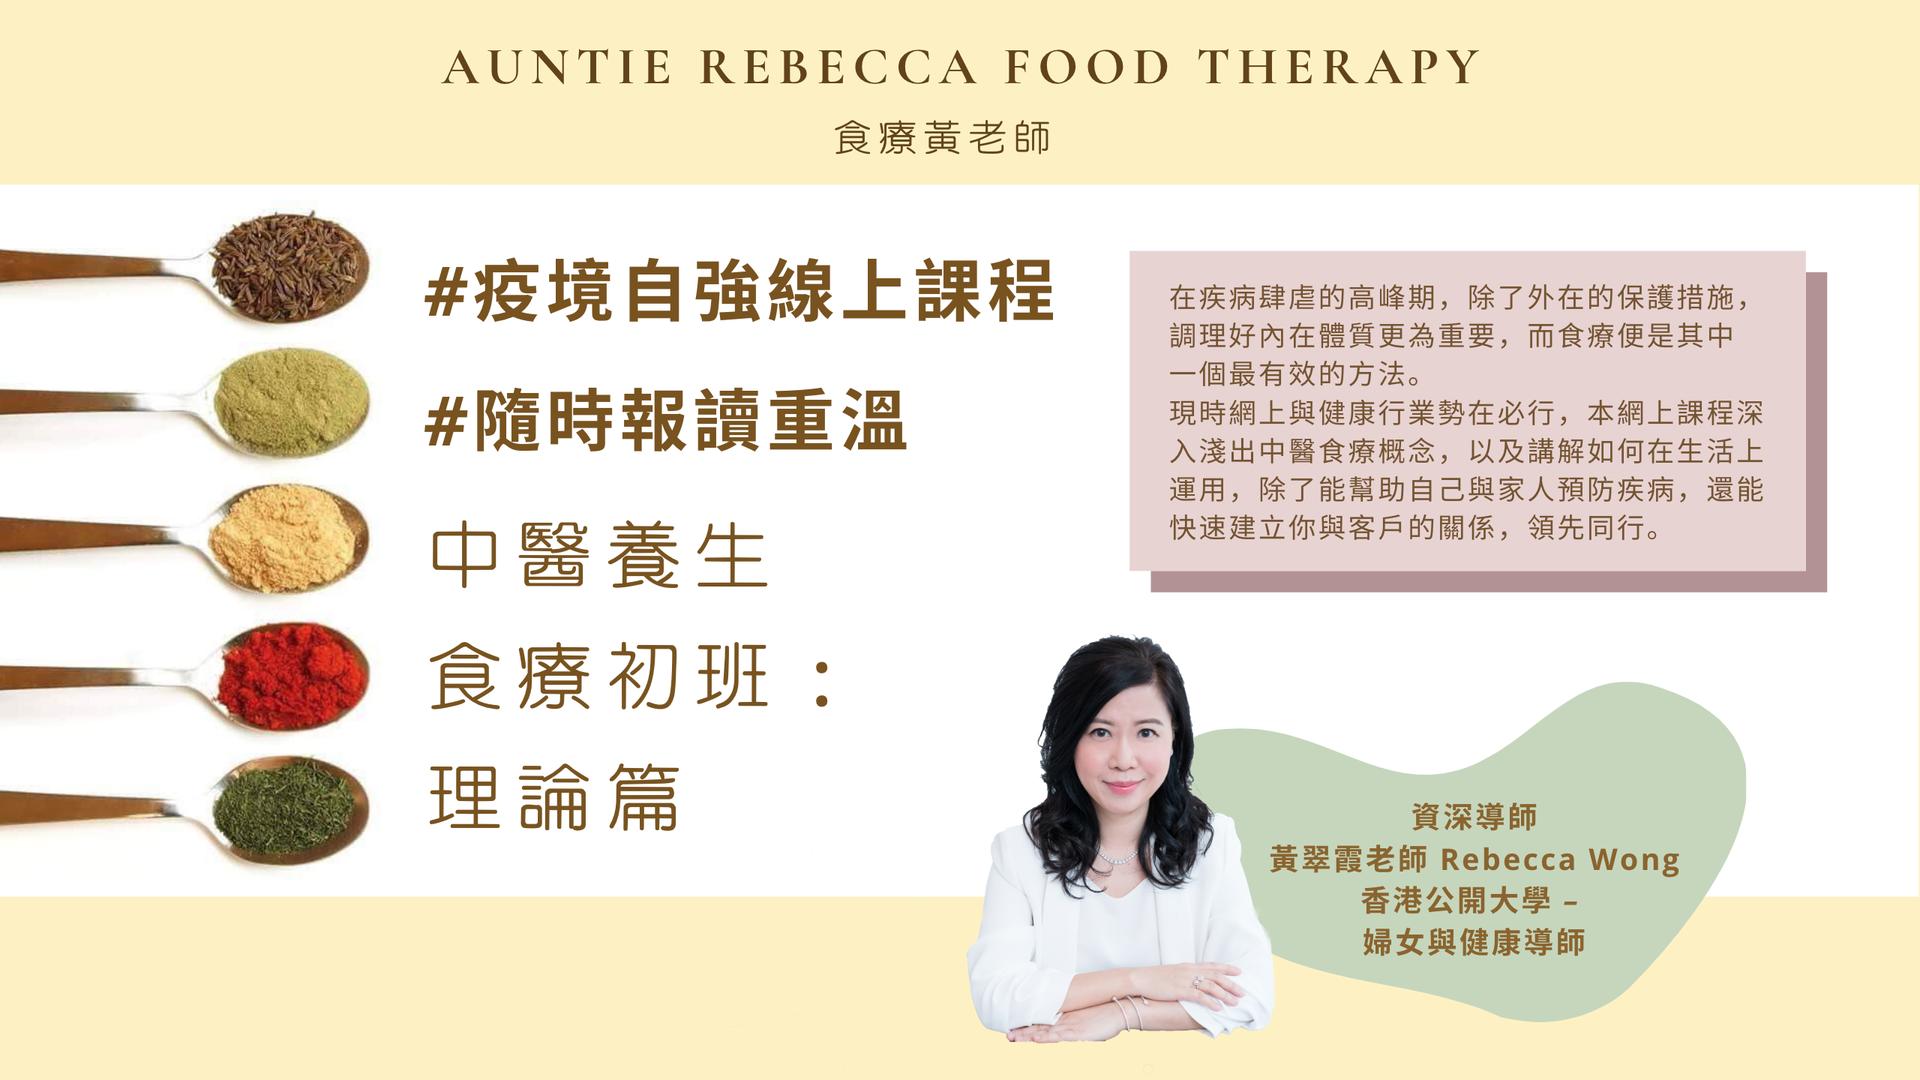 Auntie Rebecca 中醫養生食療初班:理論篇